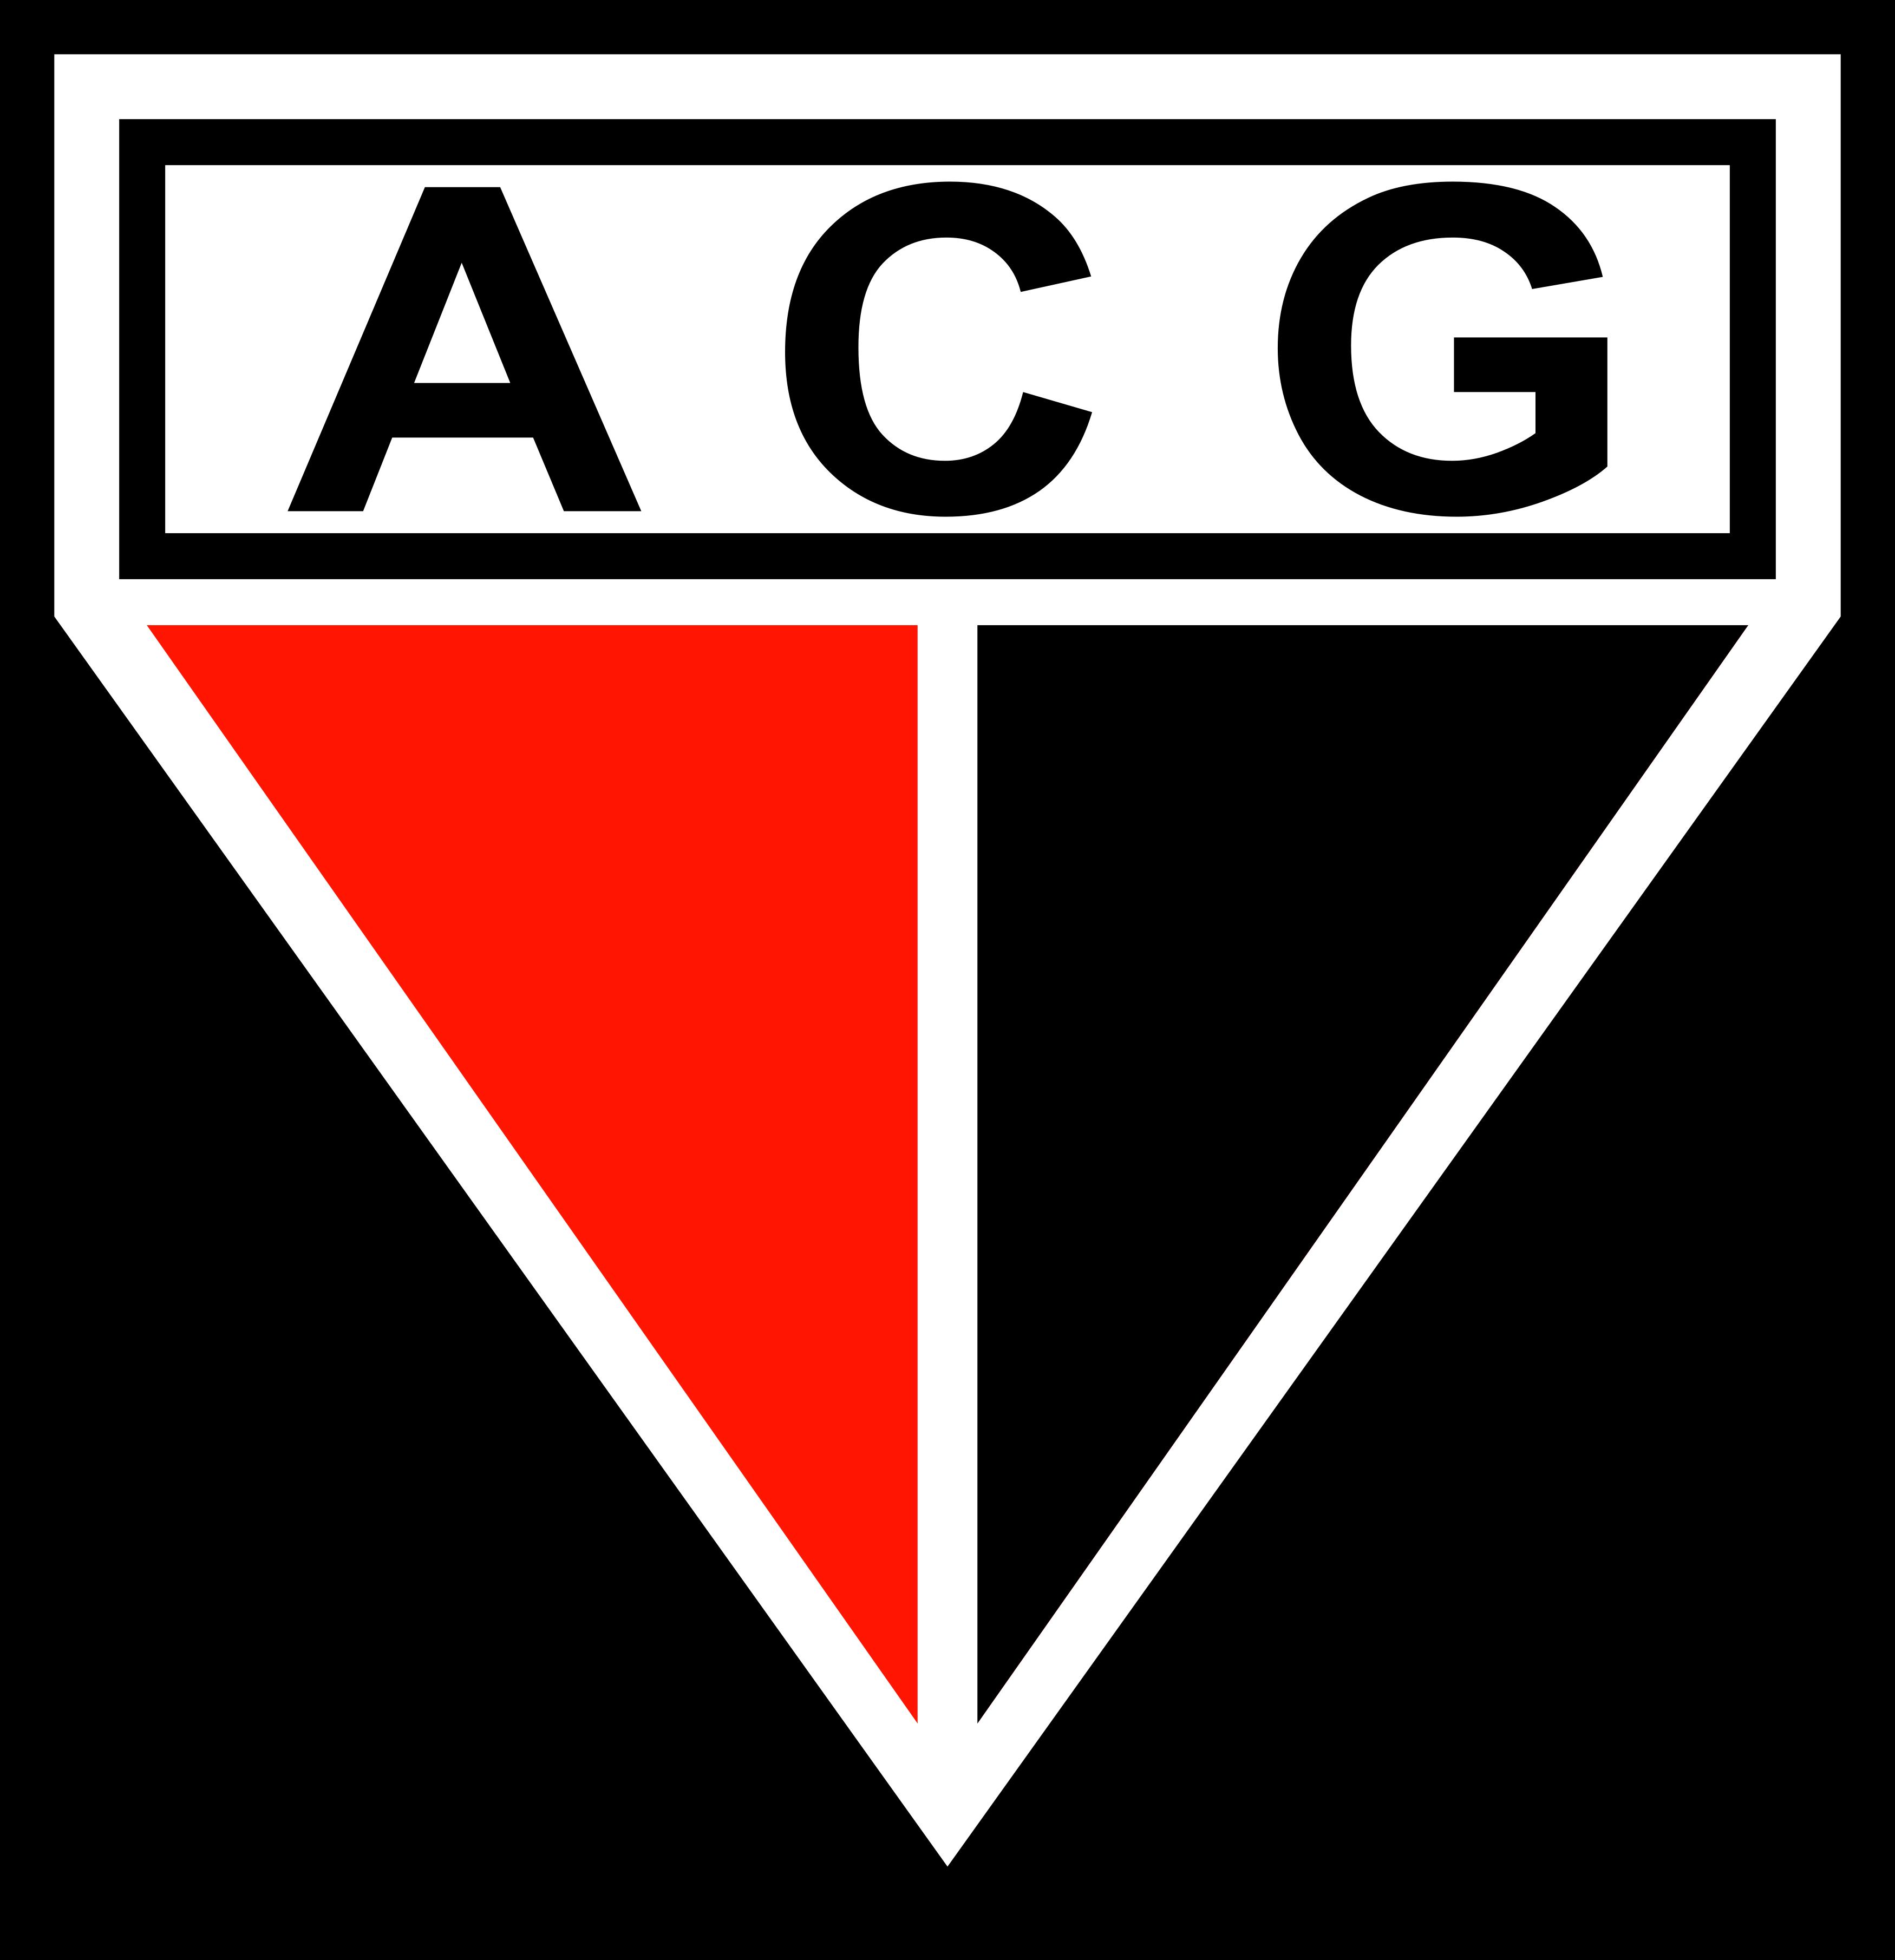 atletico go logo escudo - Atlético Goianiense Logo